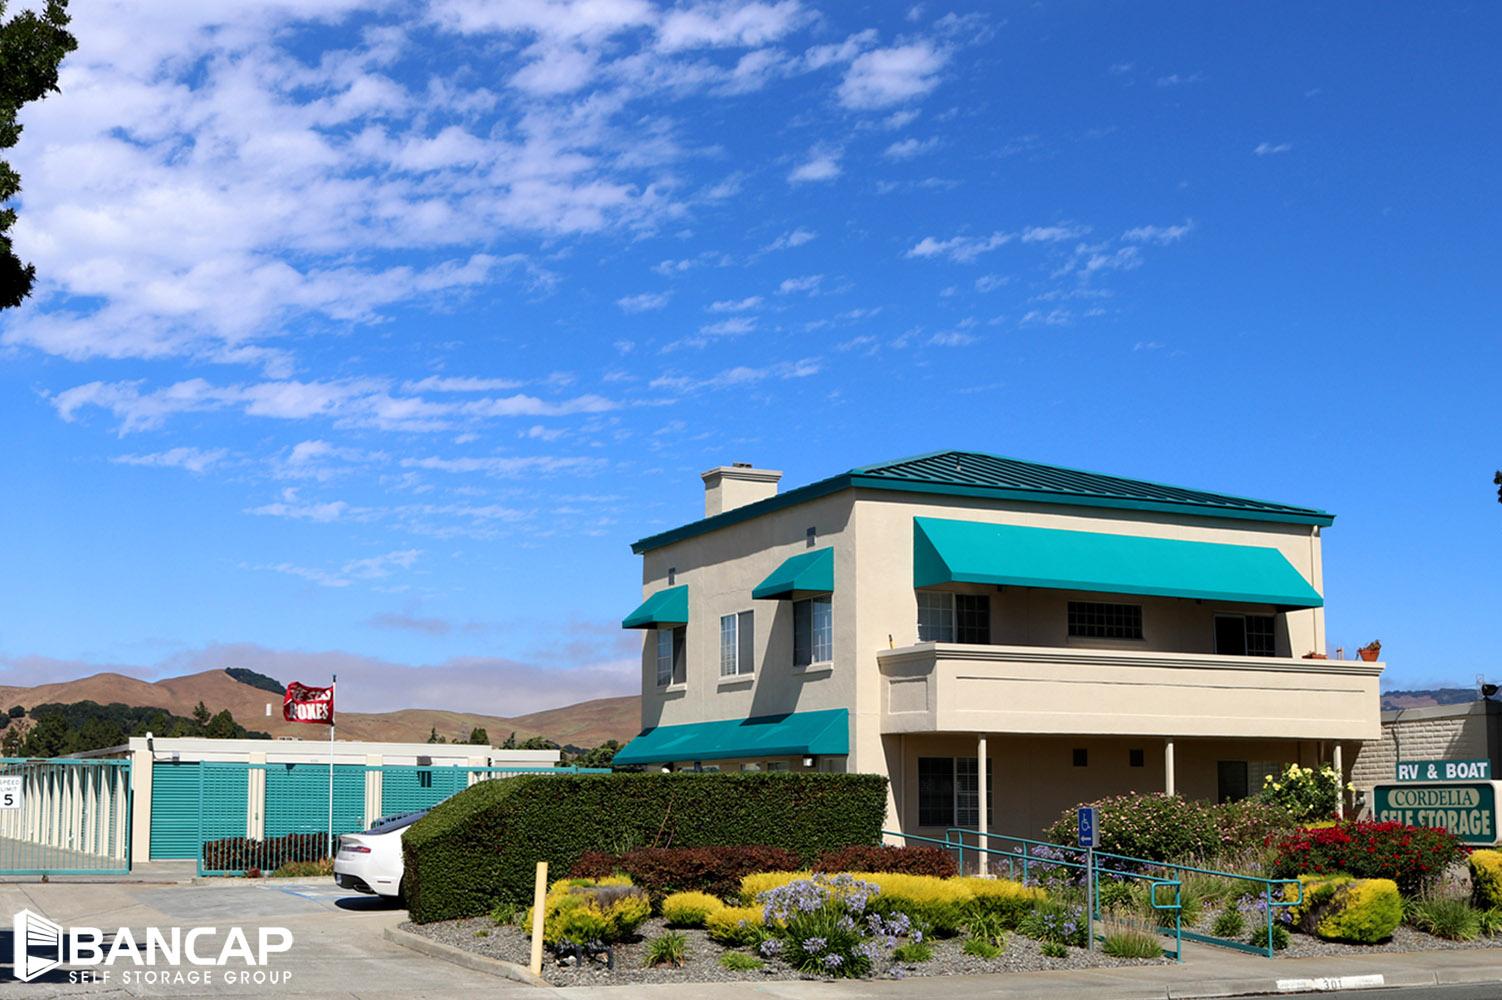 Solano County Self Storage Portfolio Sold